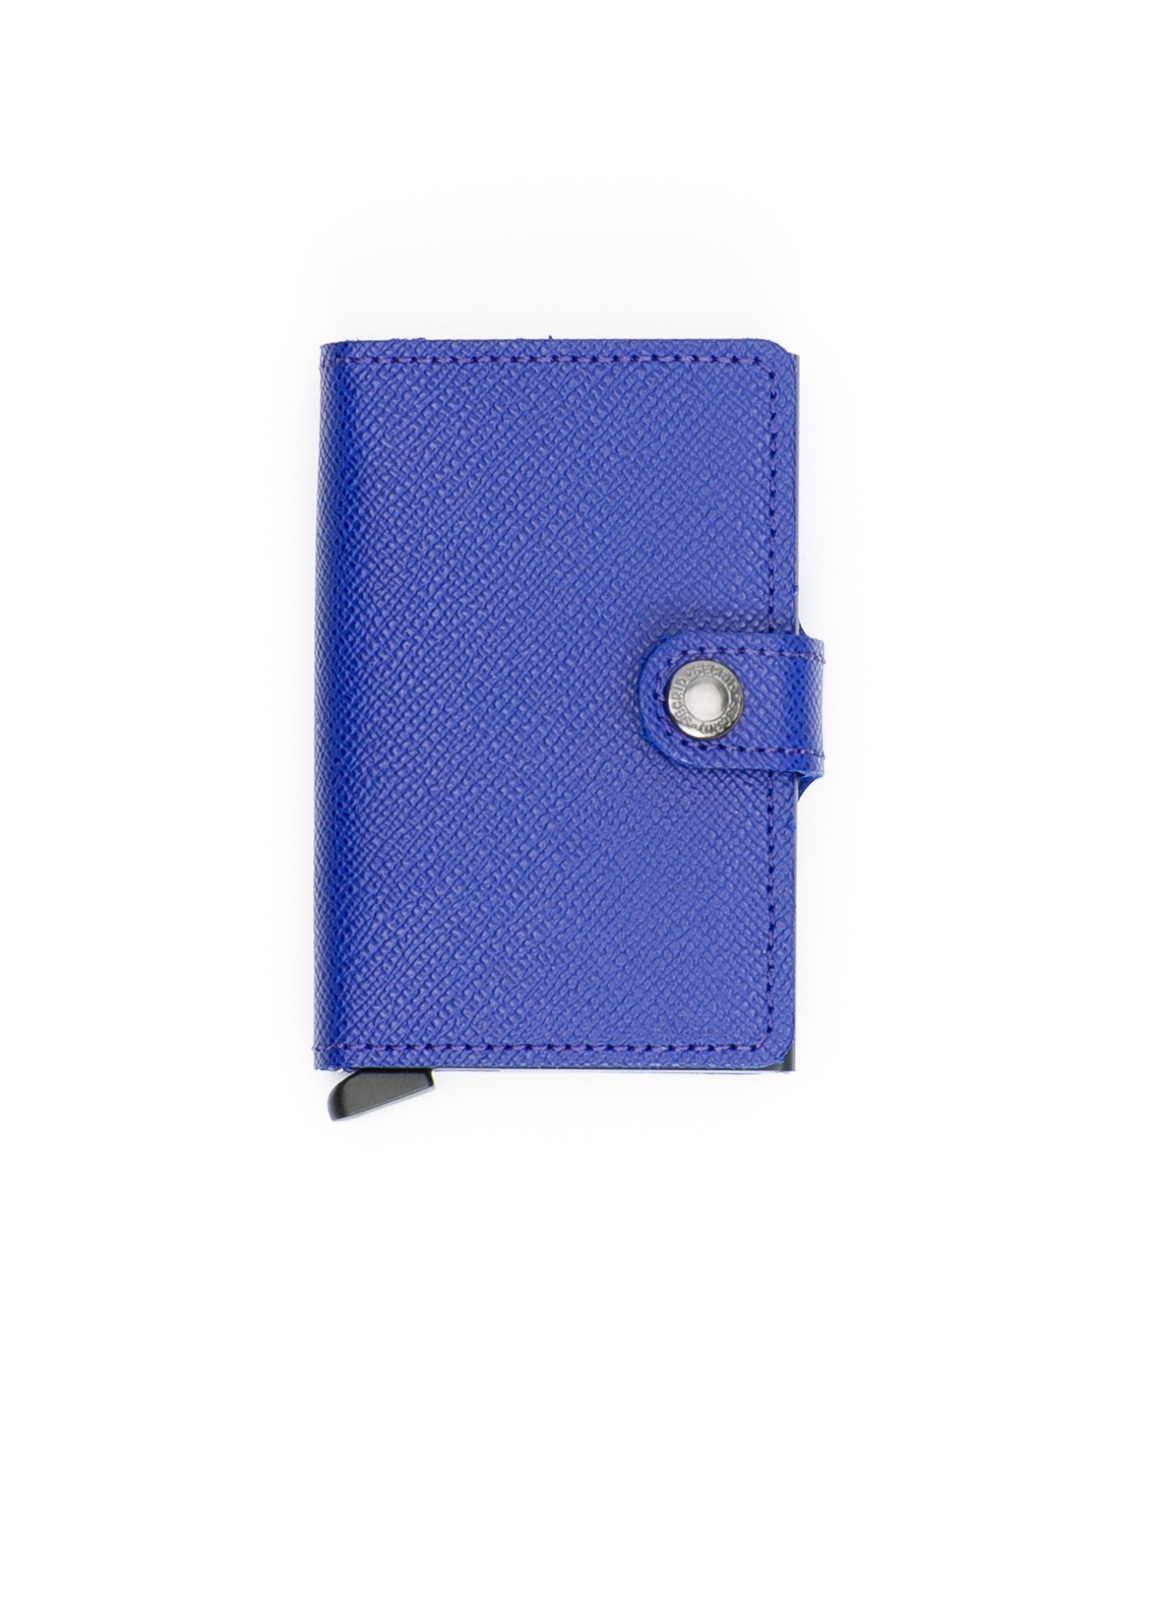 Secrid MINIWALLET. Piel color azul tinta, con cardprotector de aluminio ultrafino.